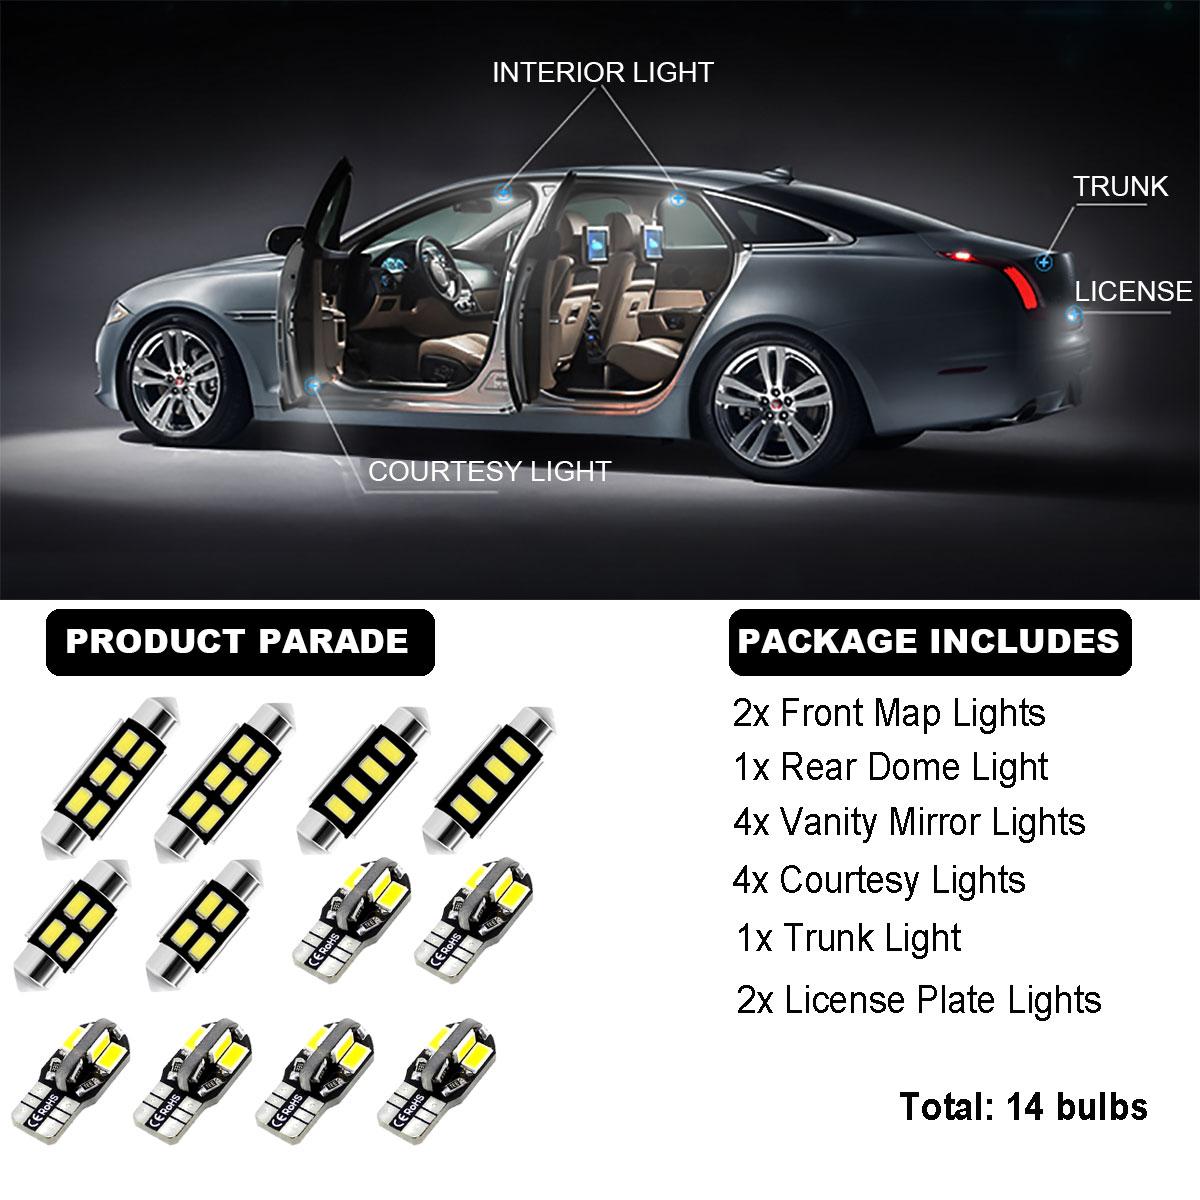 14Bulbs LED Interior Dome Light Kit Xenon White 6000K For